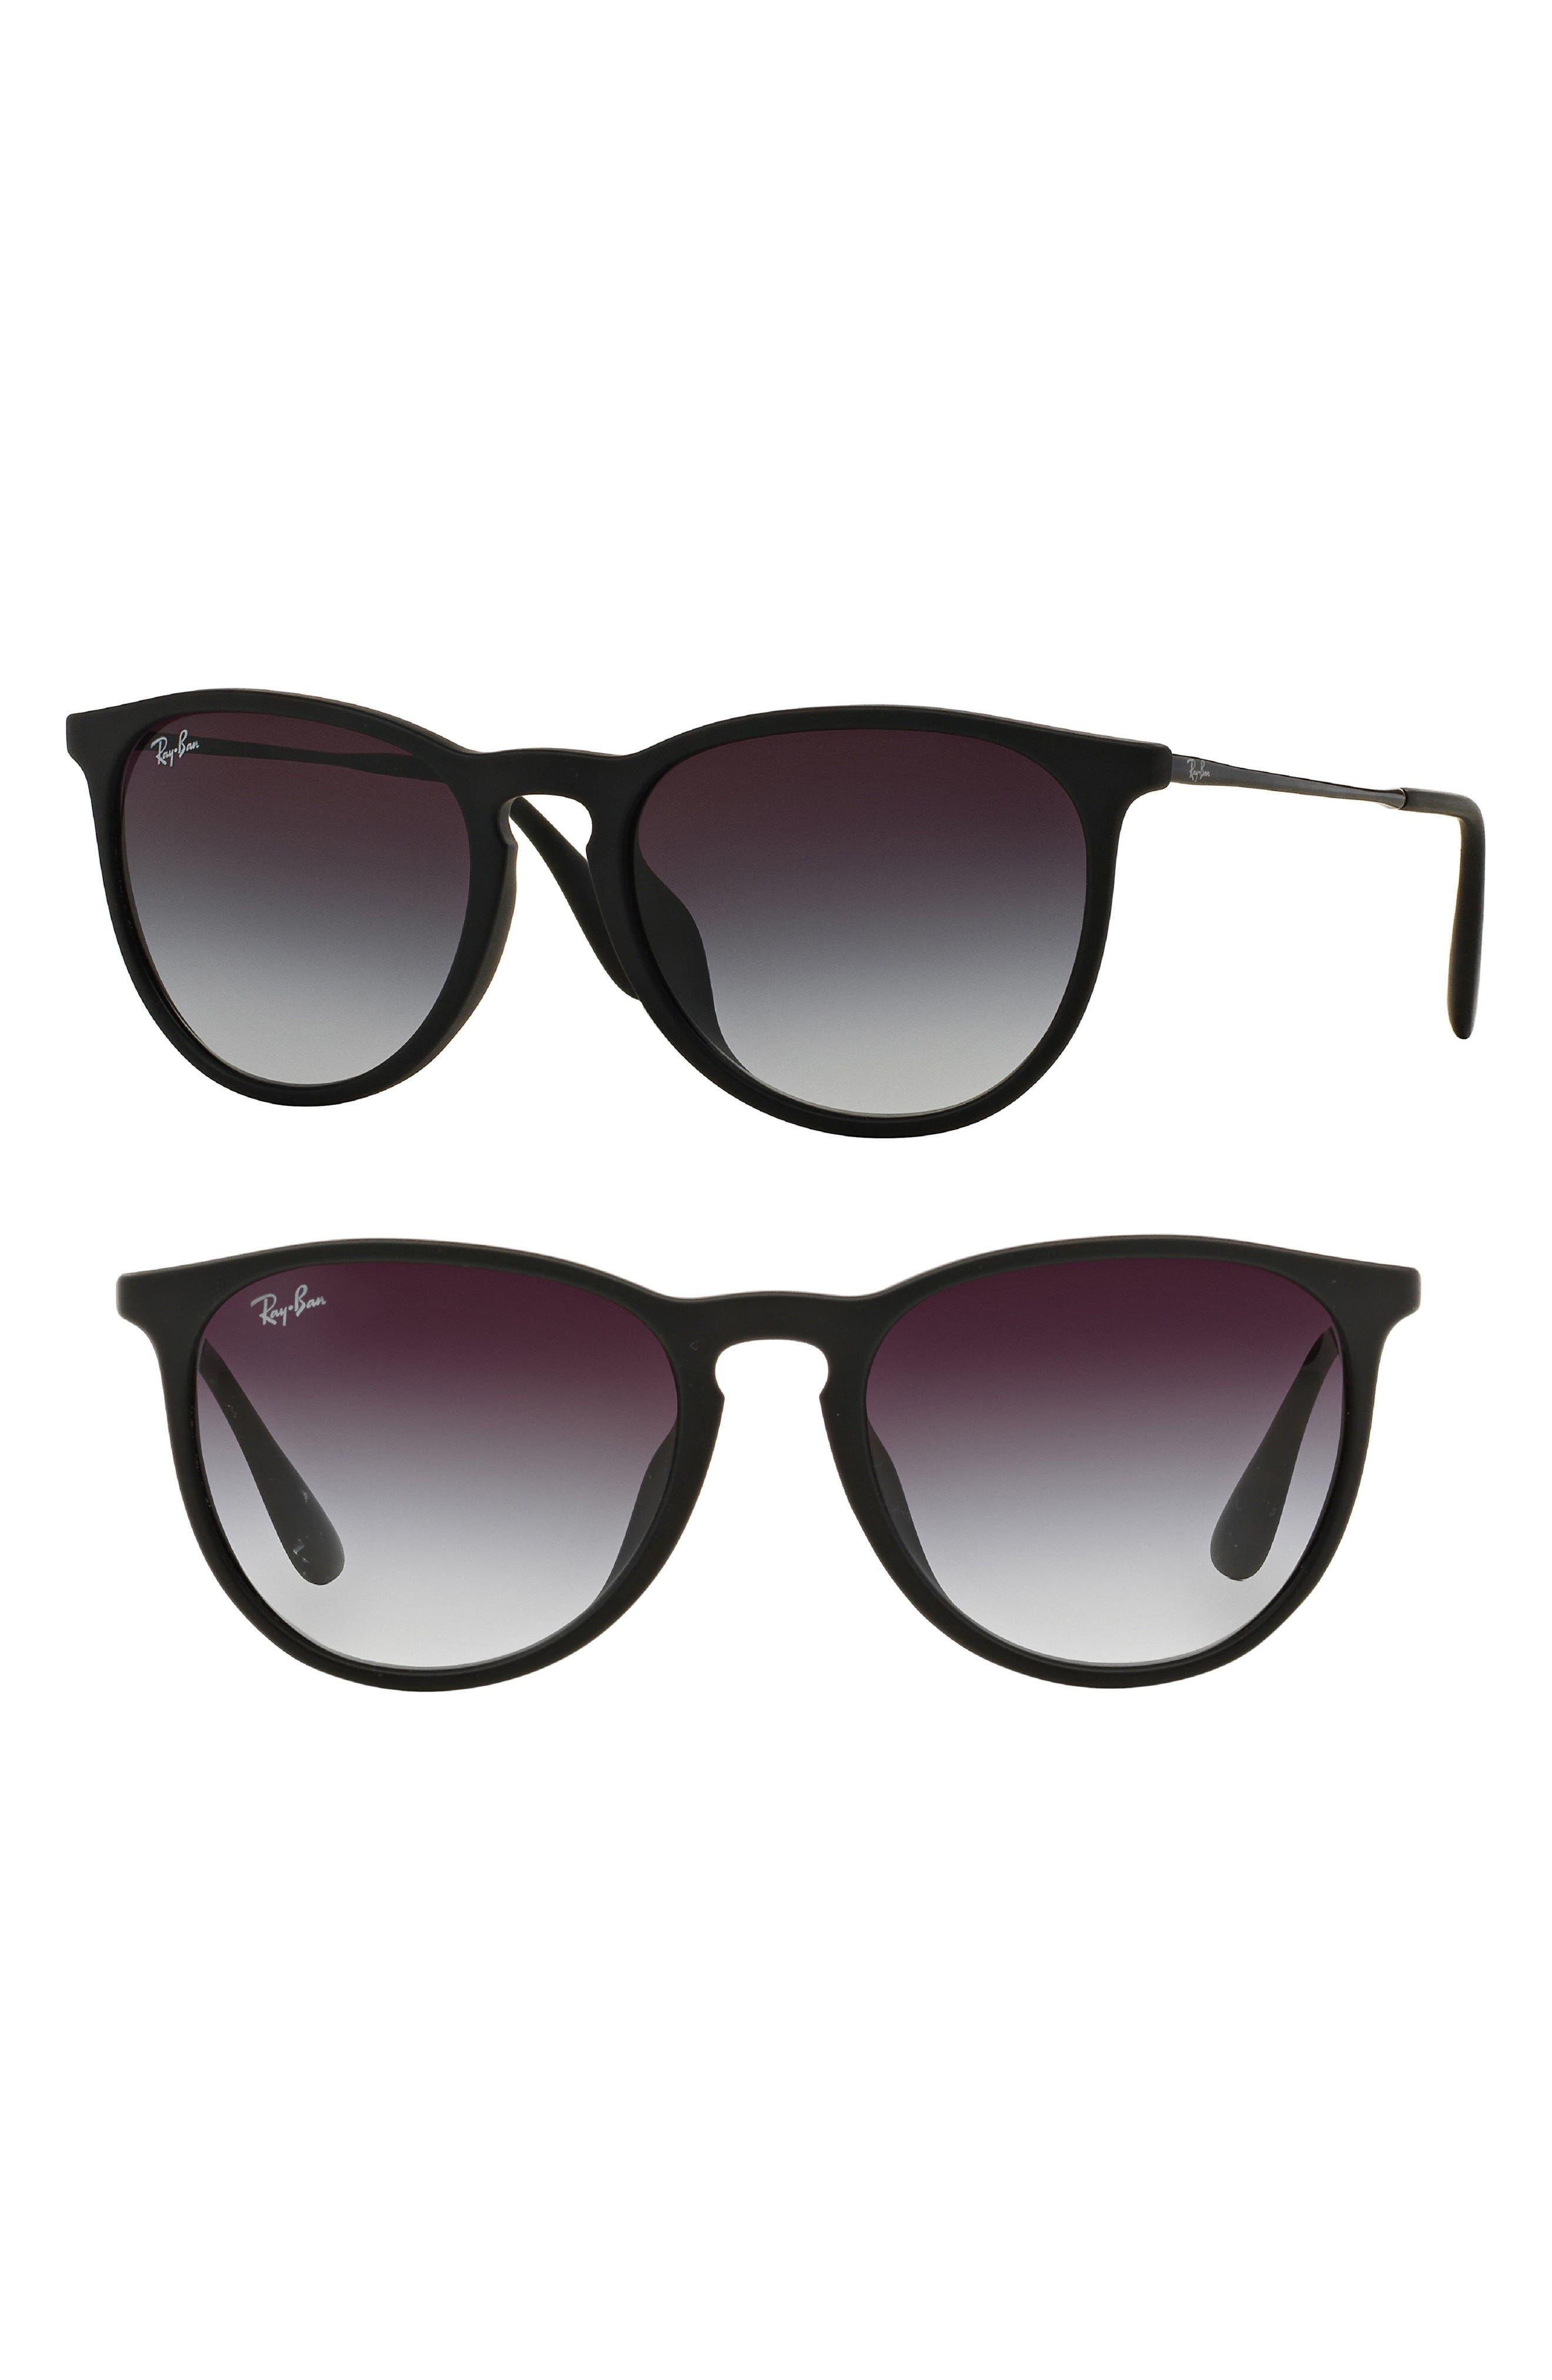 Erika Classic 57mm Sunglasses,                         Main,                         color, 001